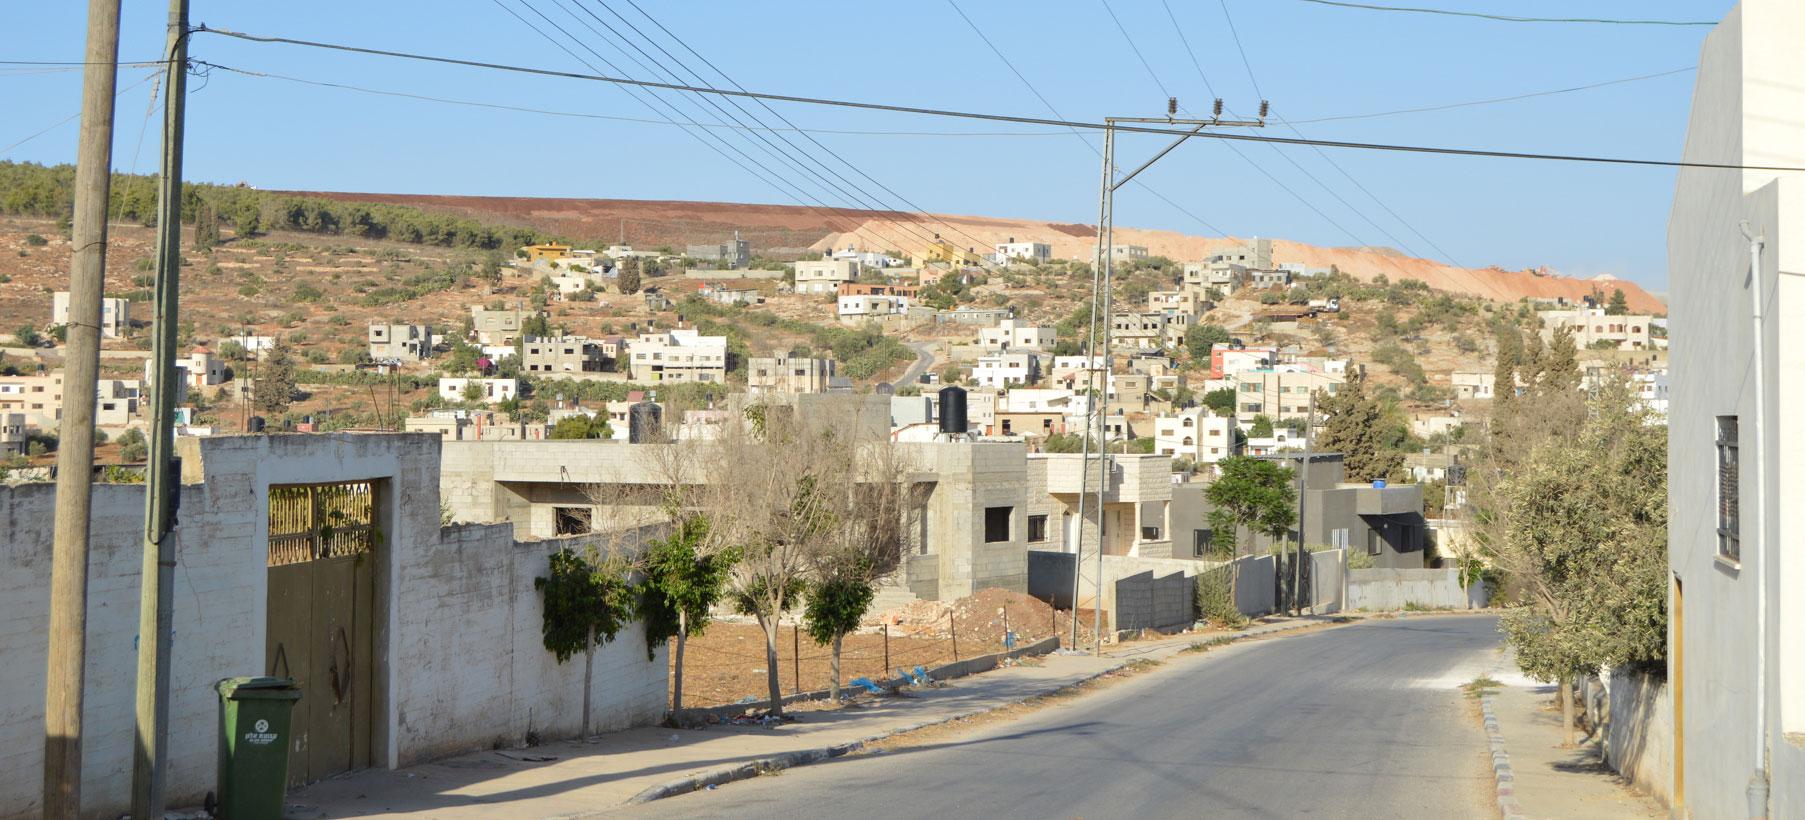 Jalbun, Palestine